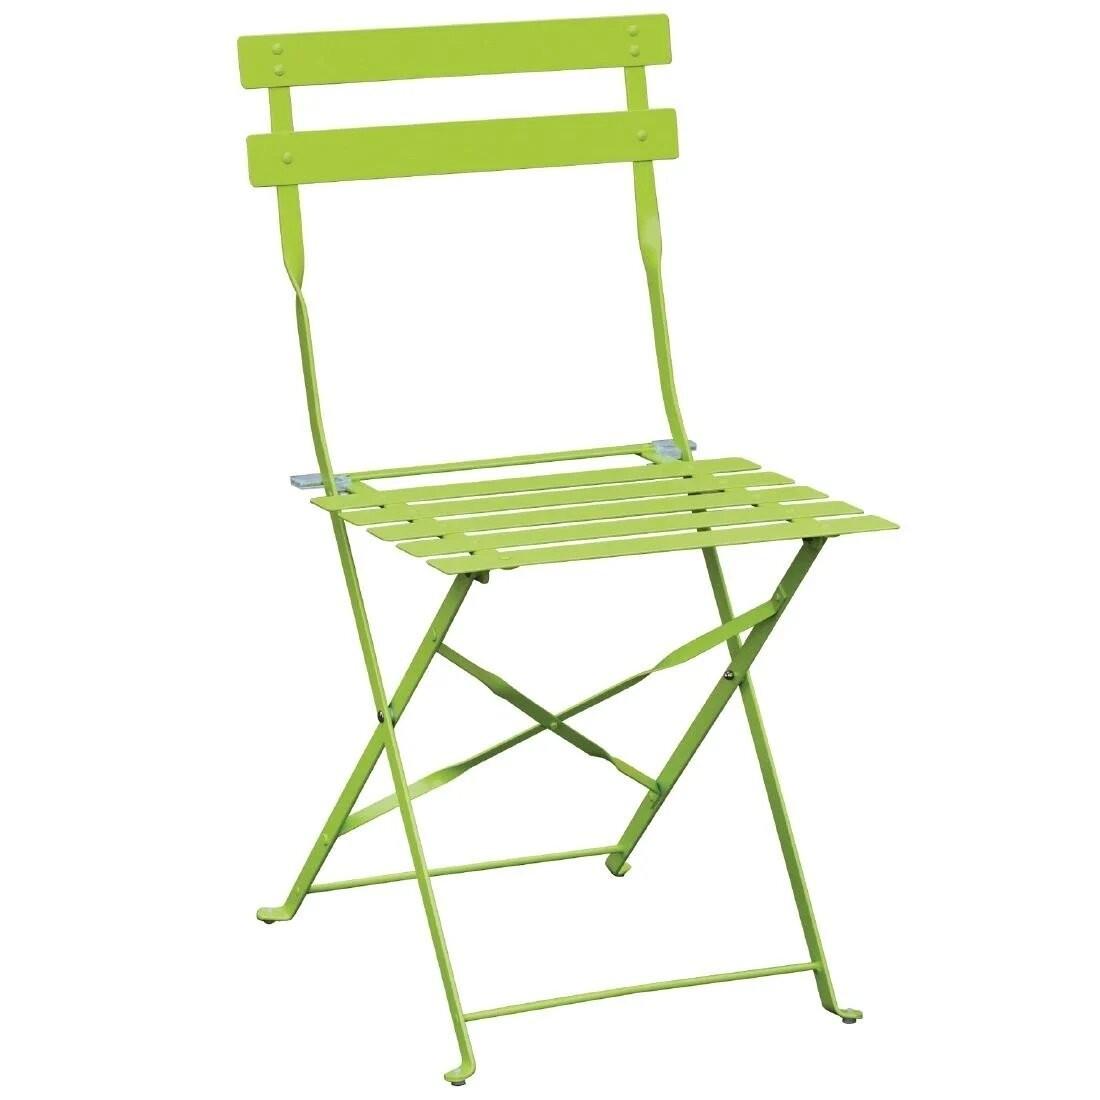 Bolero GH552 Green Steel Frame & Seat Pavement Style Folding Chairs - Pack 2